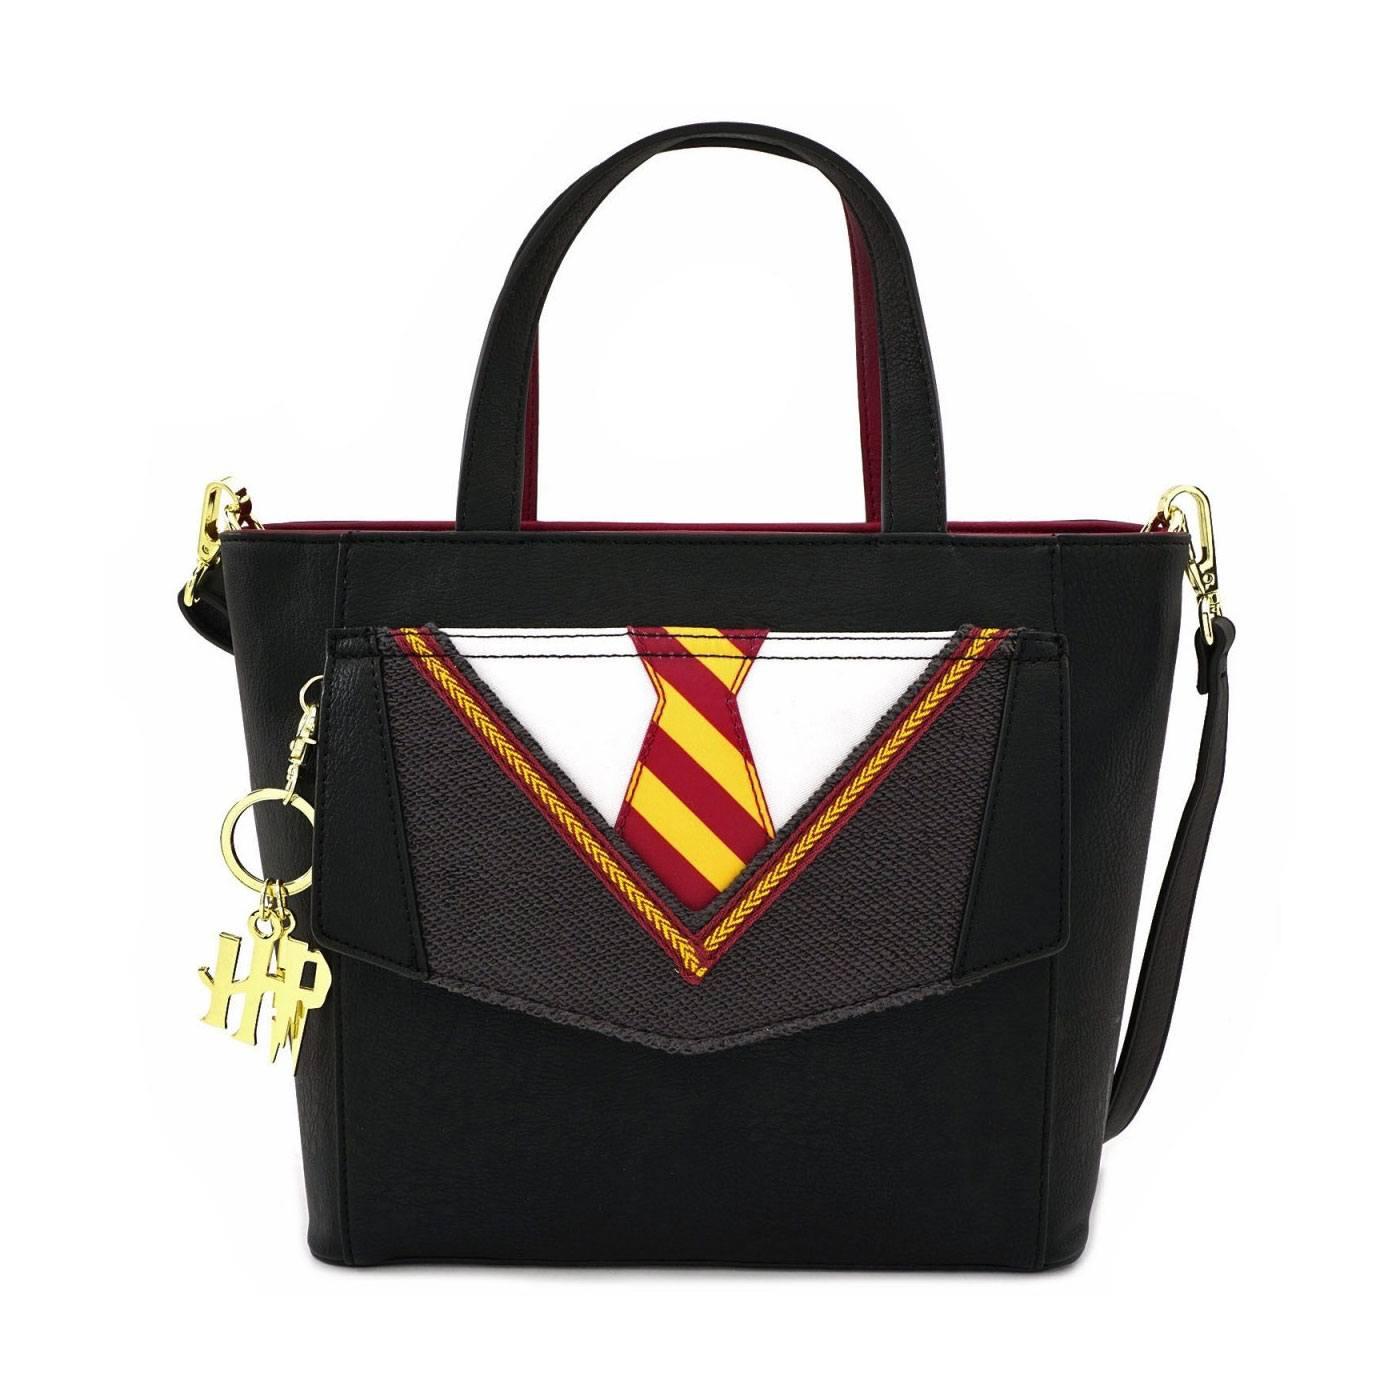 Harry Potter by Loungefly Crossbody Gryffindor Uniform